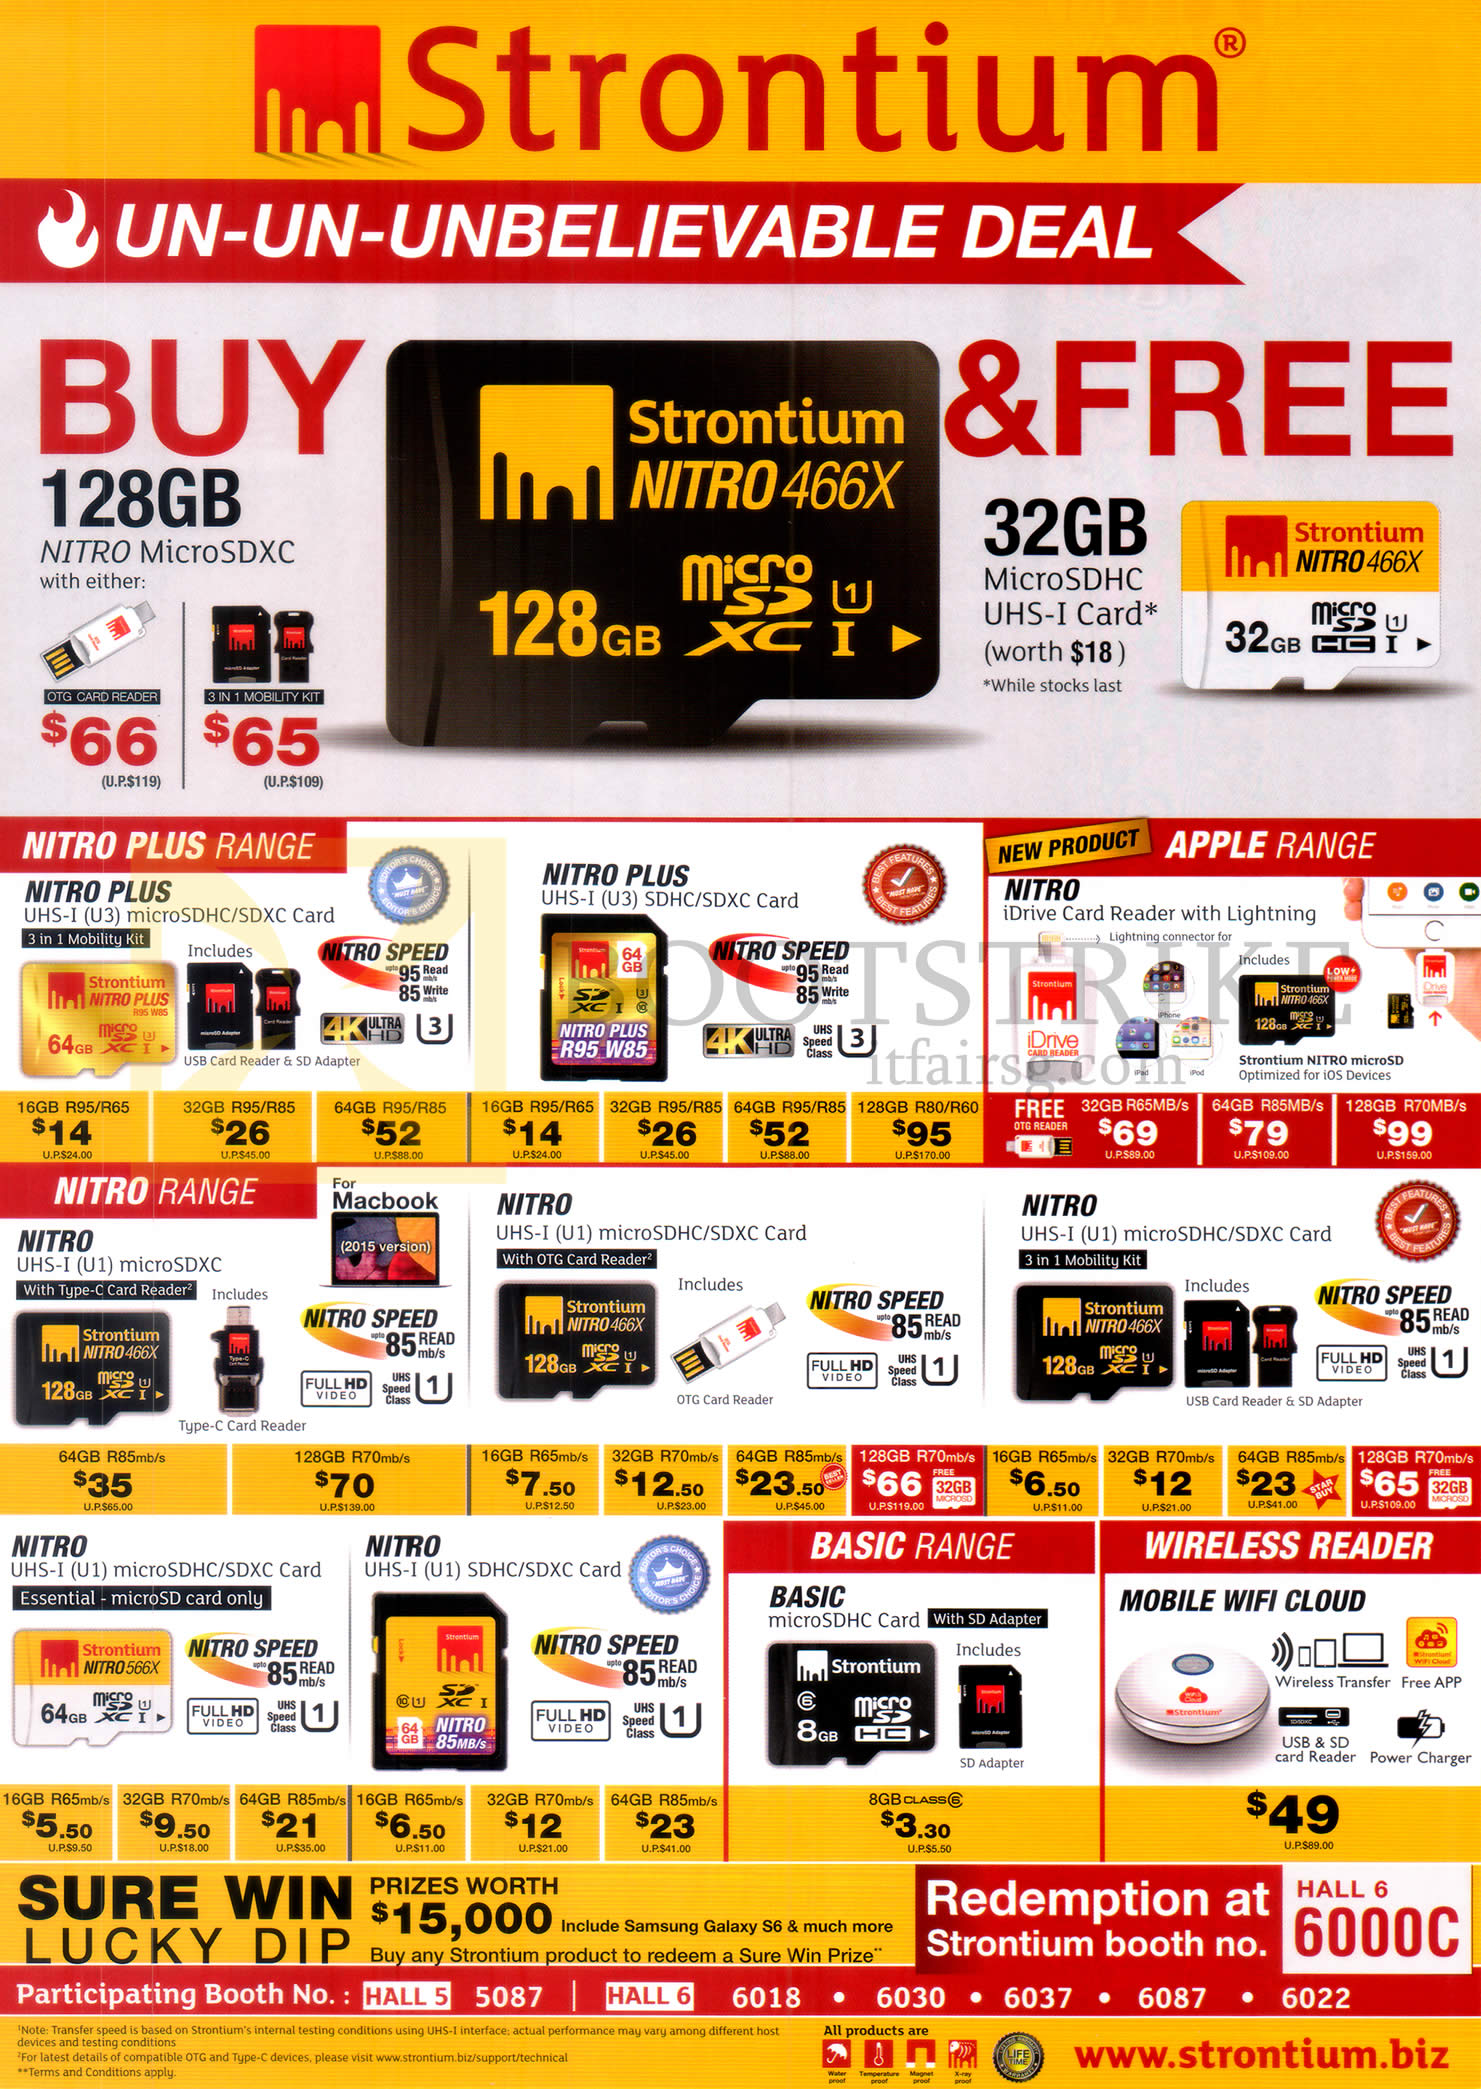 PC SHOW 2016 price list image brochure of Strontium SD Cards Nitro Plus, Apple, Nitro, Basic Range, Wireless Reader